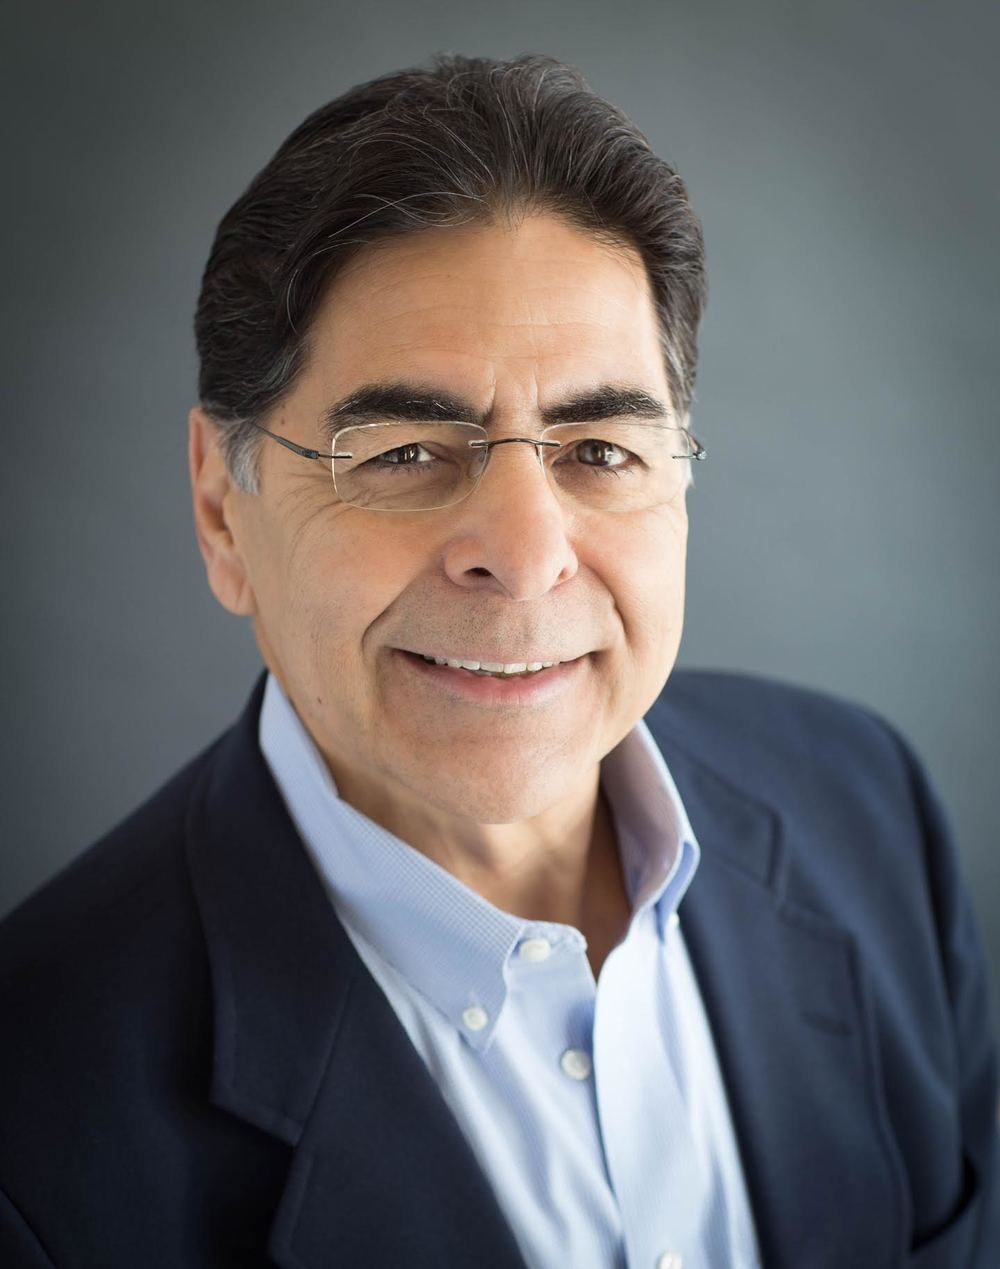 Lionel Garcia